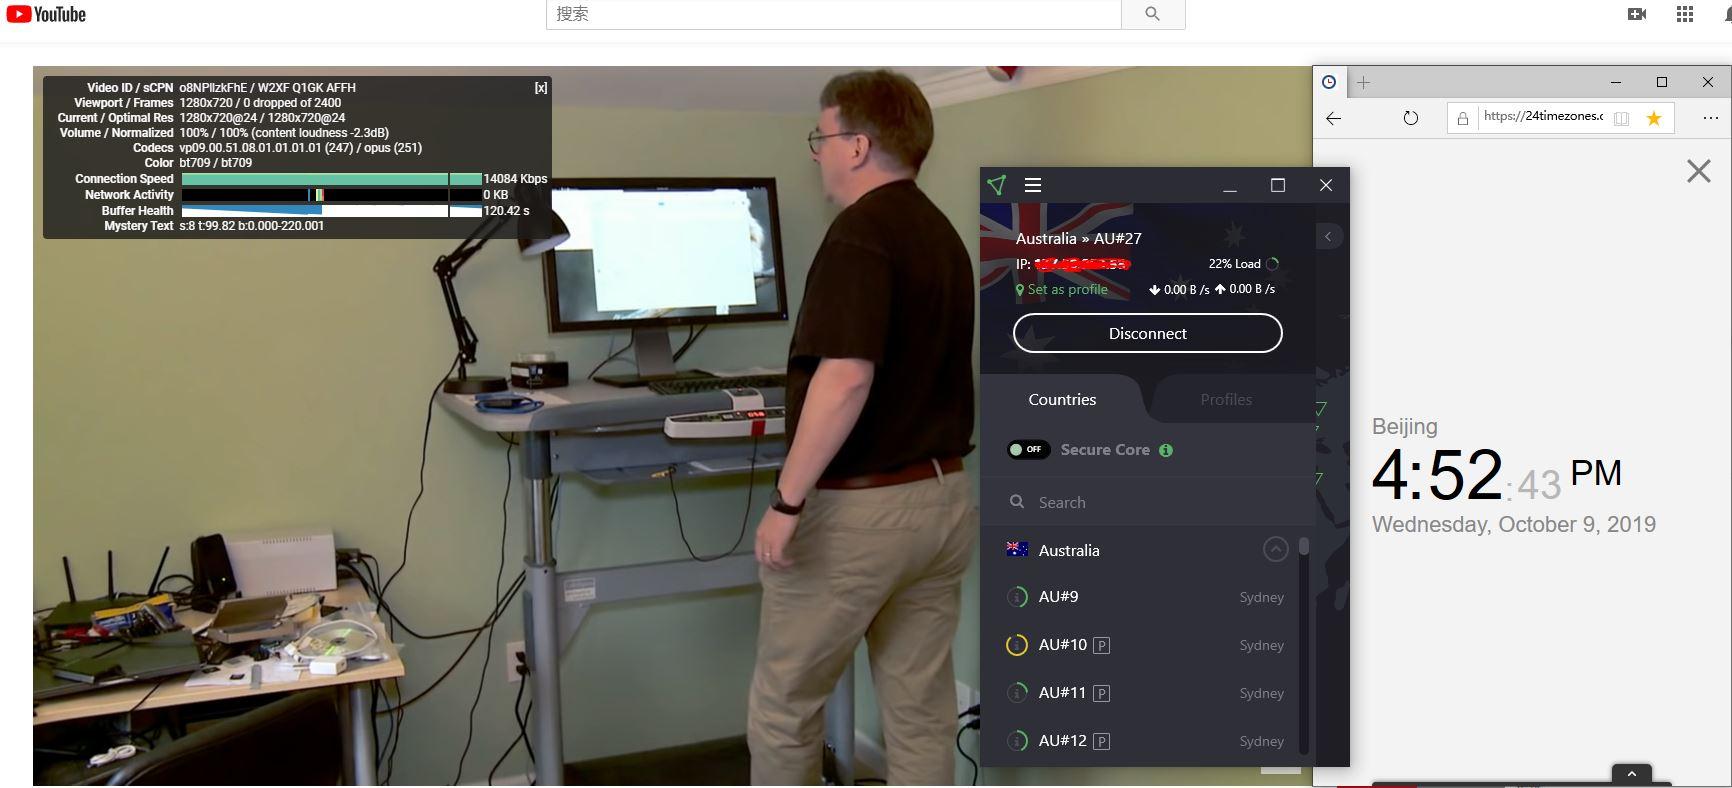 Windows ProtonVPN Australia-27 中国VPN翻墙 科学上网 YouTube速测-20191009